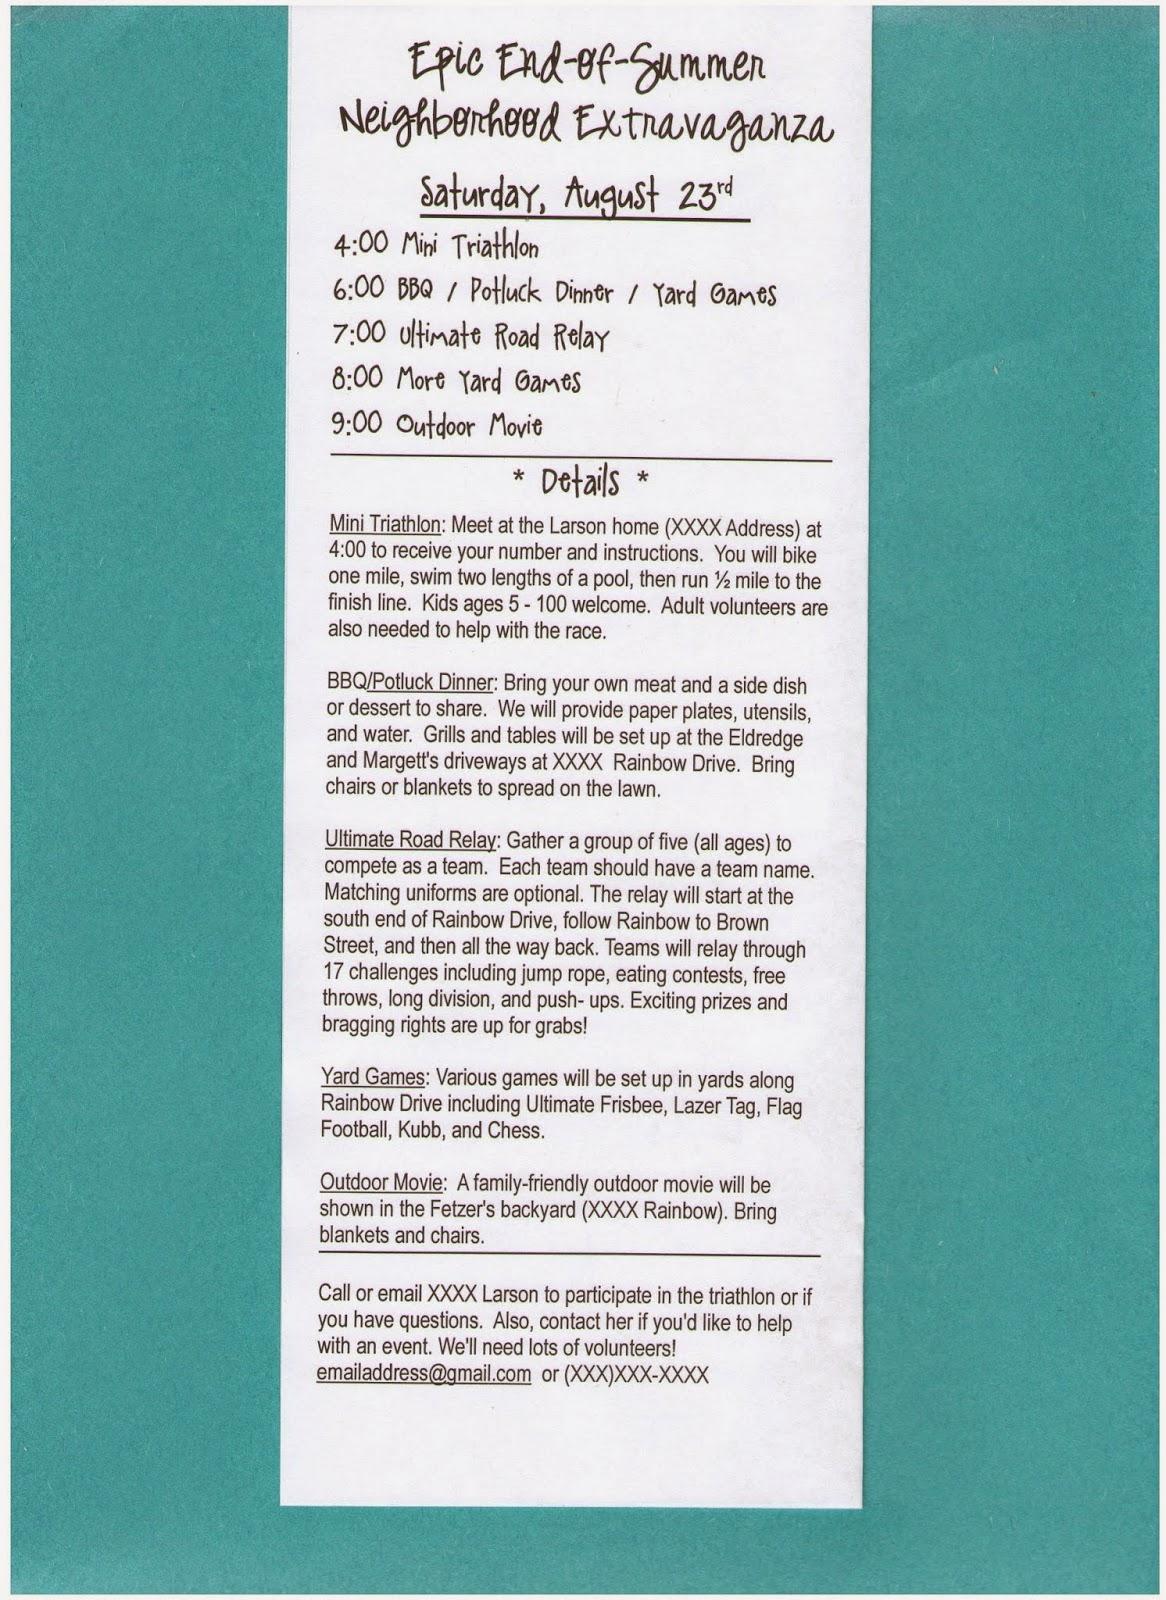 Fantastic Maths Games For Kids Age 7 Component - Math Worksheets ...